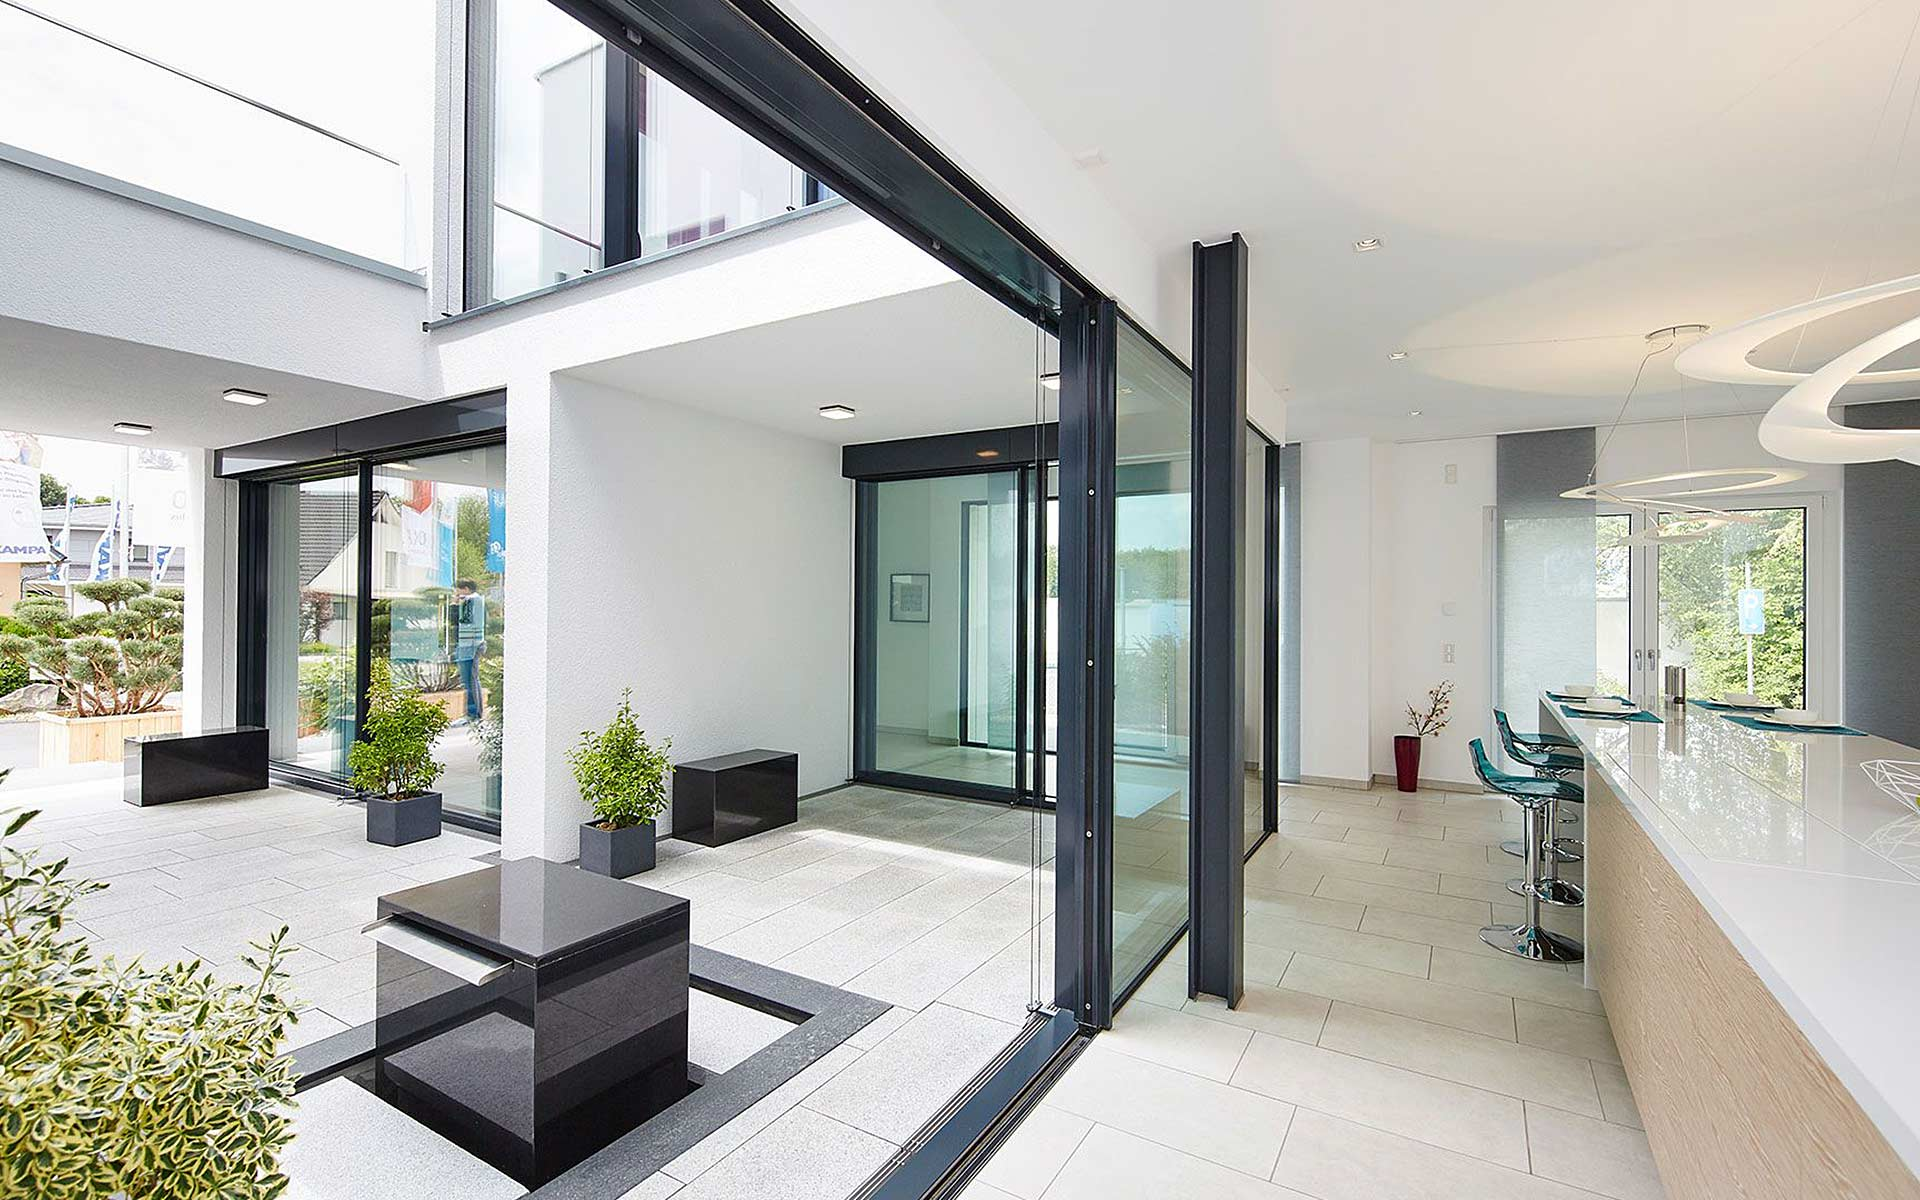 Musterhaus Bad Vilbel von OKAL Haus GmbH